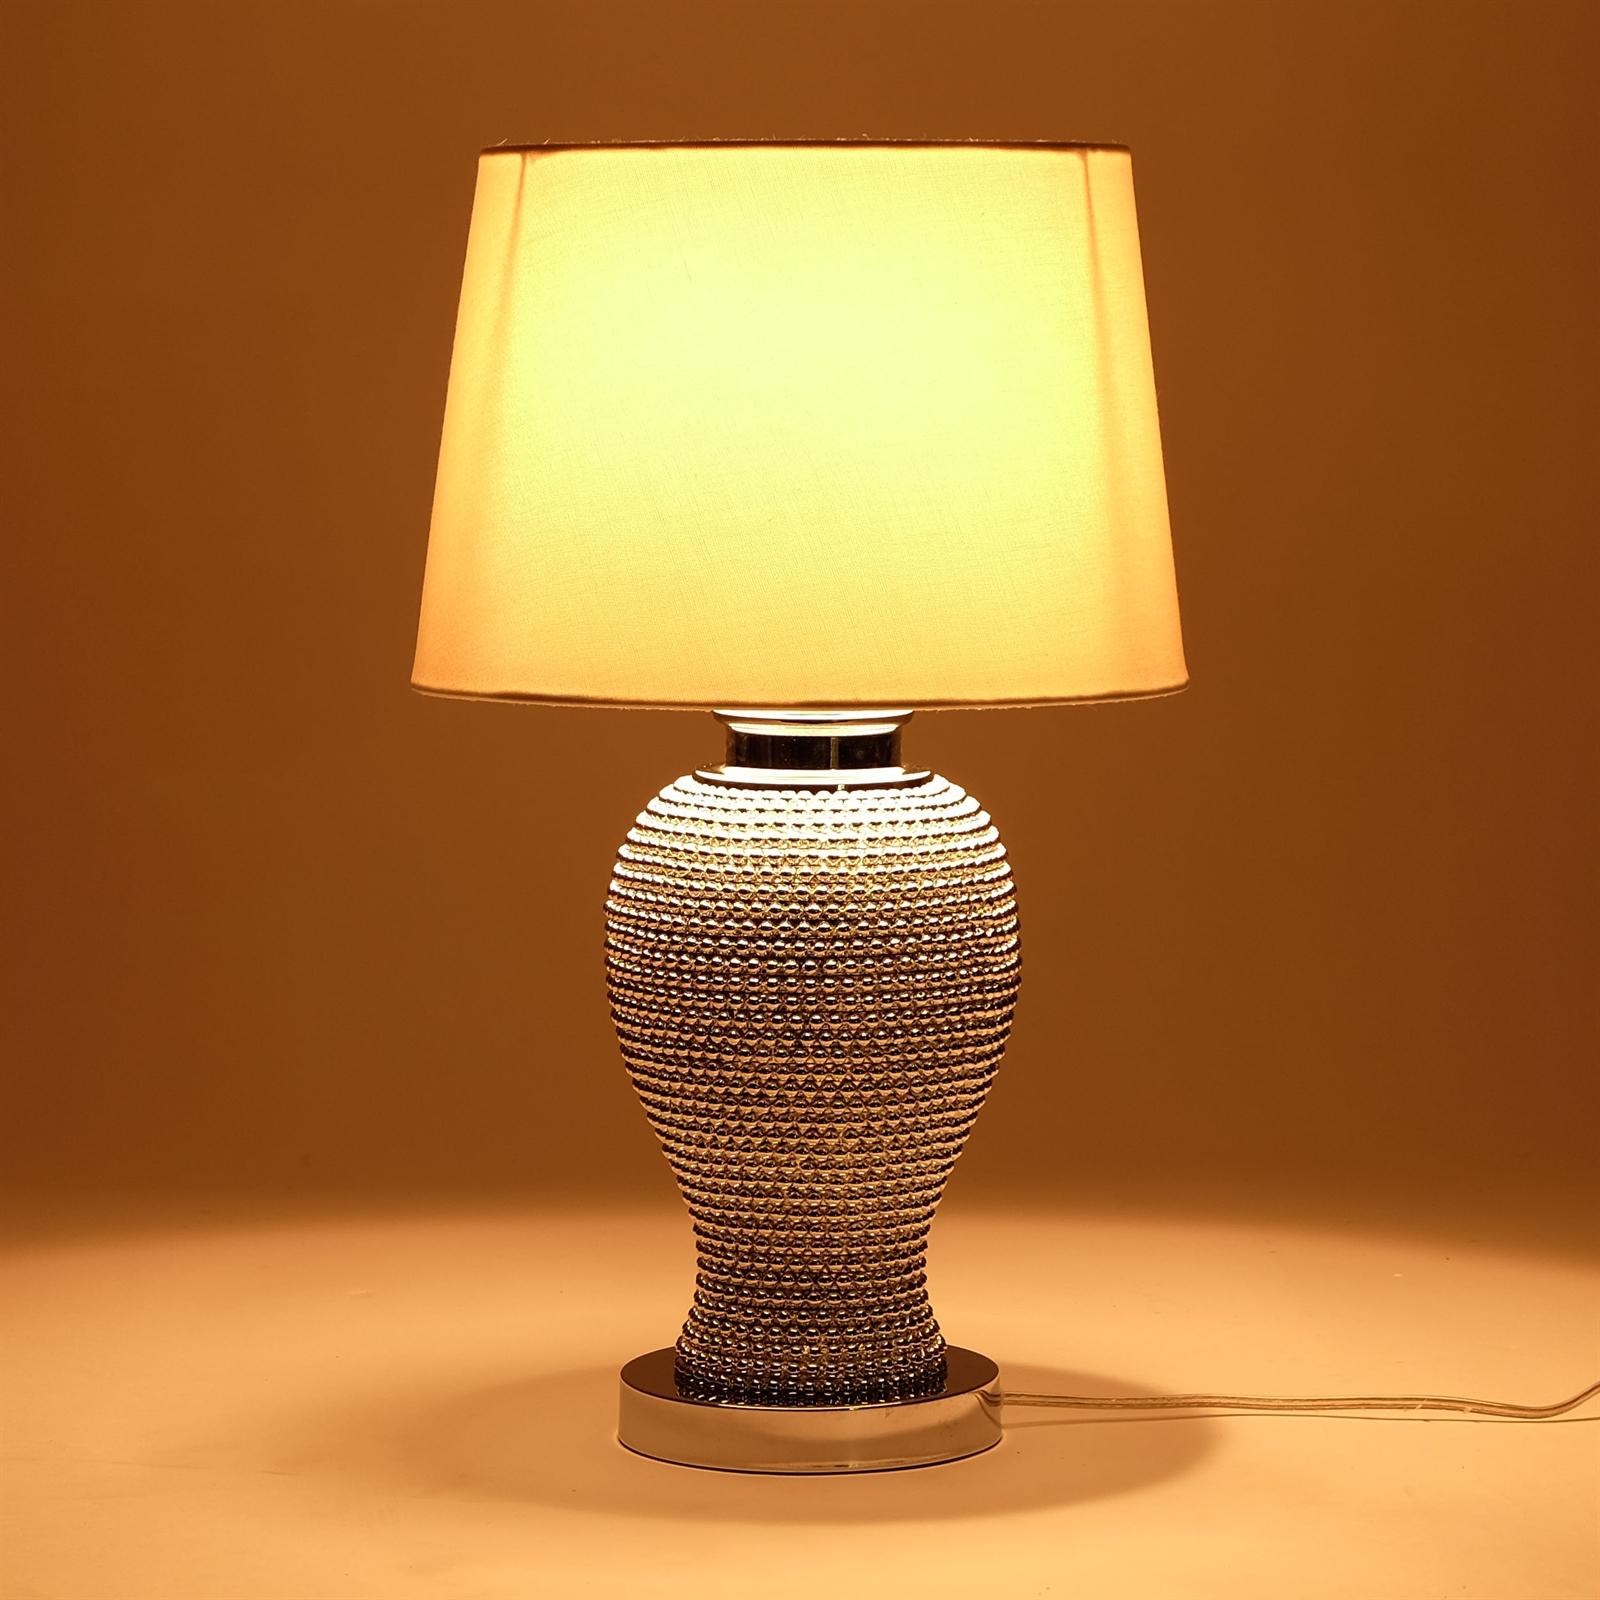 Edle design tischlampe juwel silber 55x31x31 cm for Tischlampe design